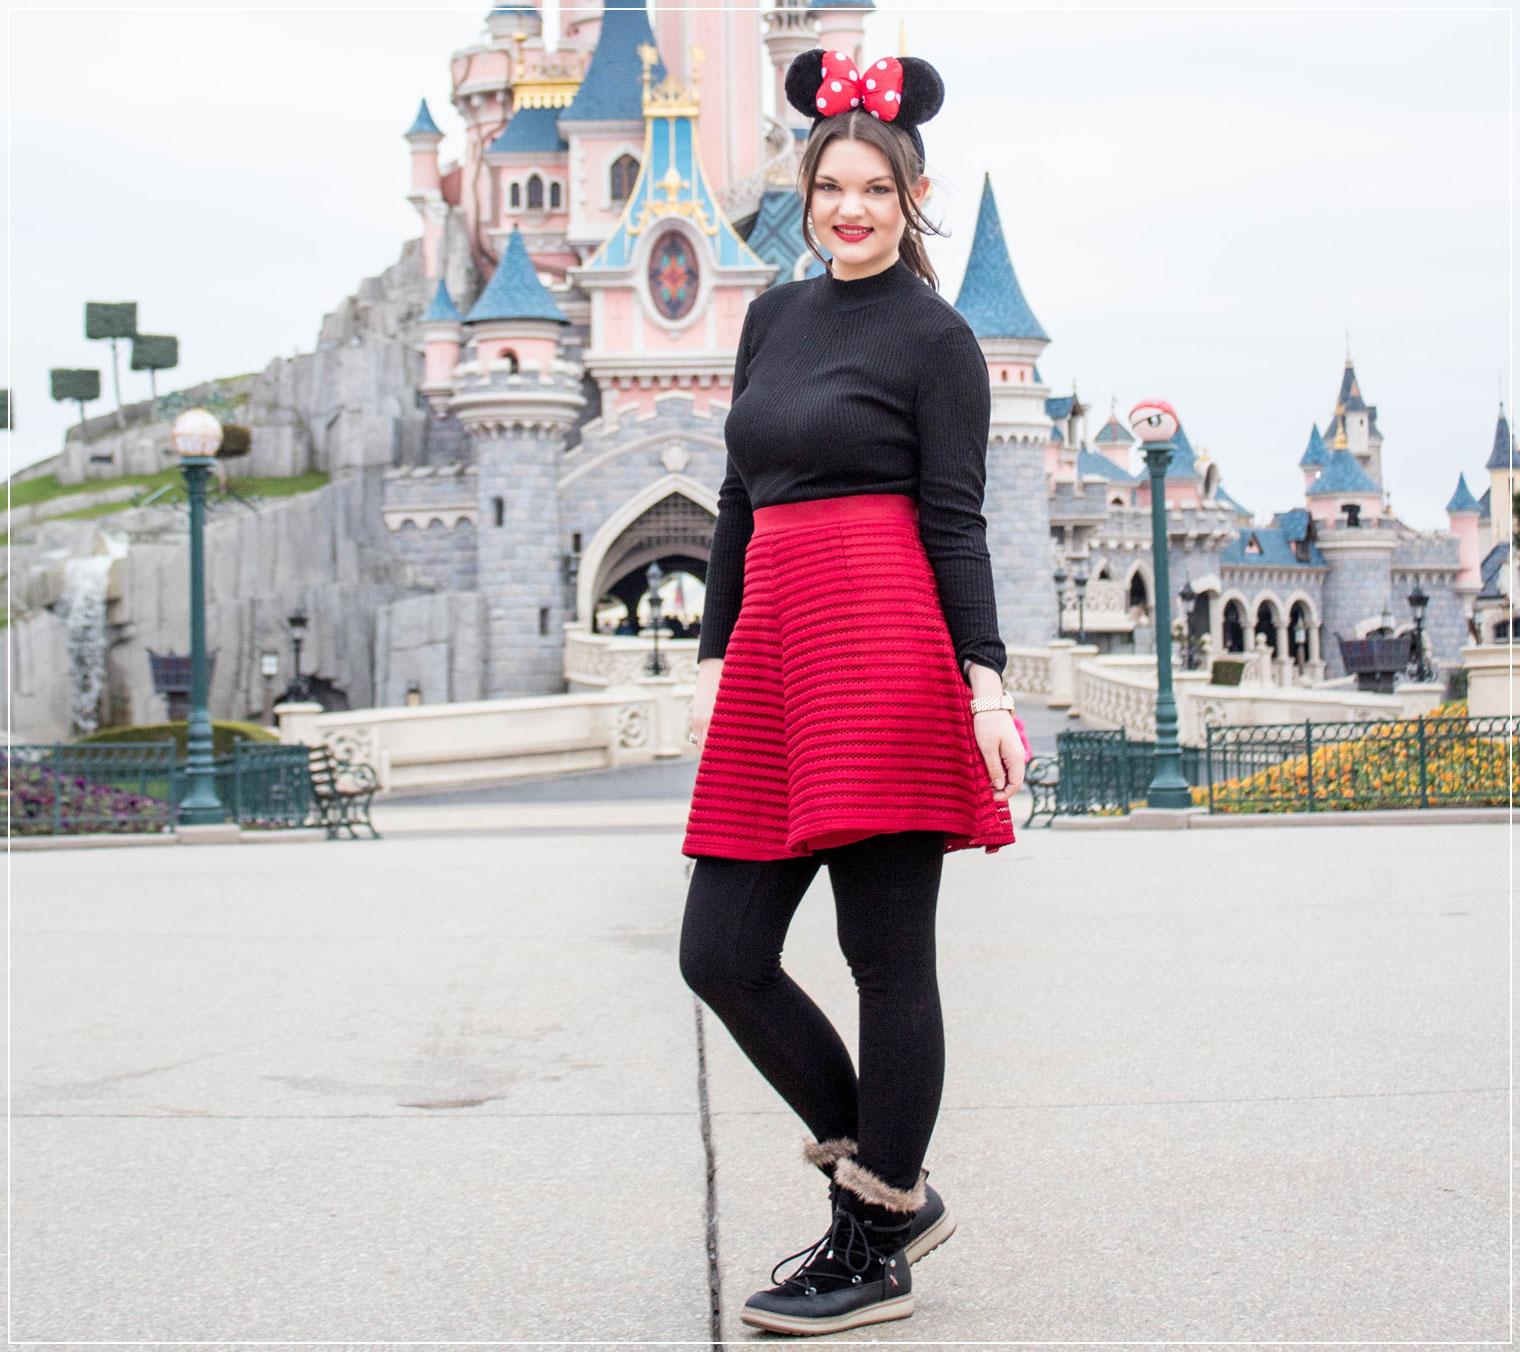 Disney-Filme, Disney, Disney-Blog, Disney-Zauber, Filmempfehlung, Blog, Ruhrgebiet, Modeblog